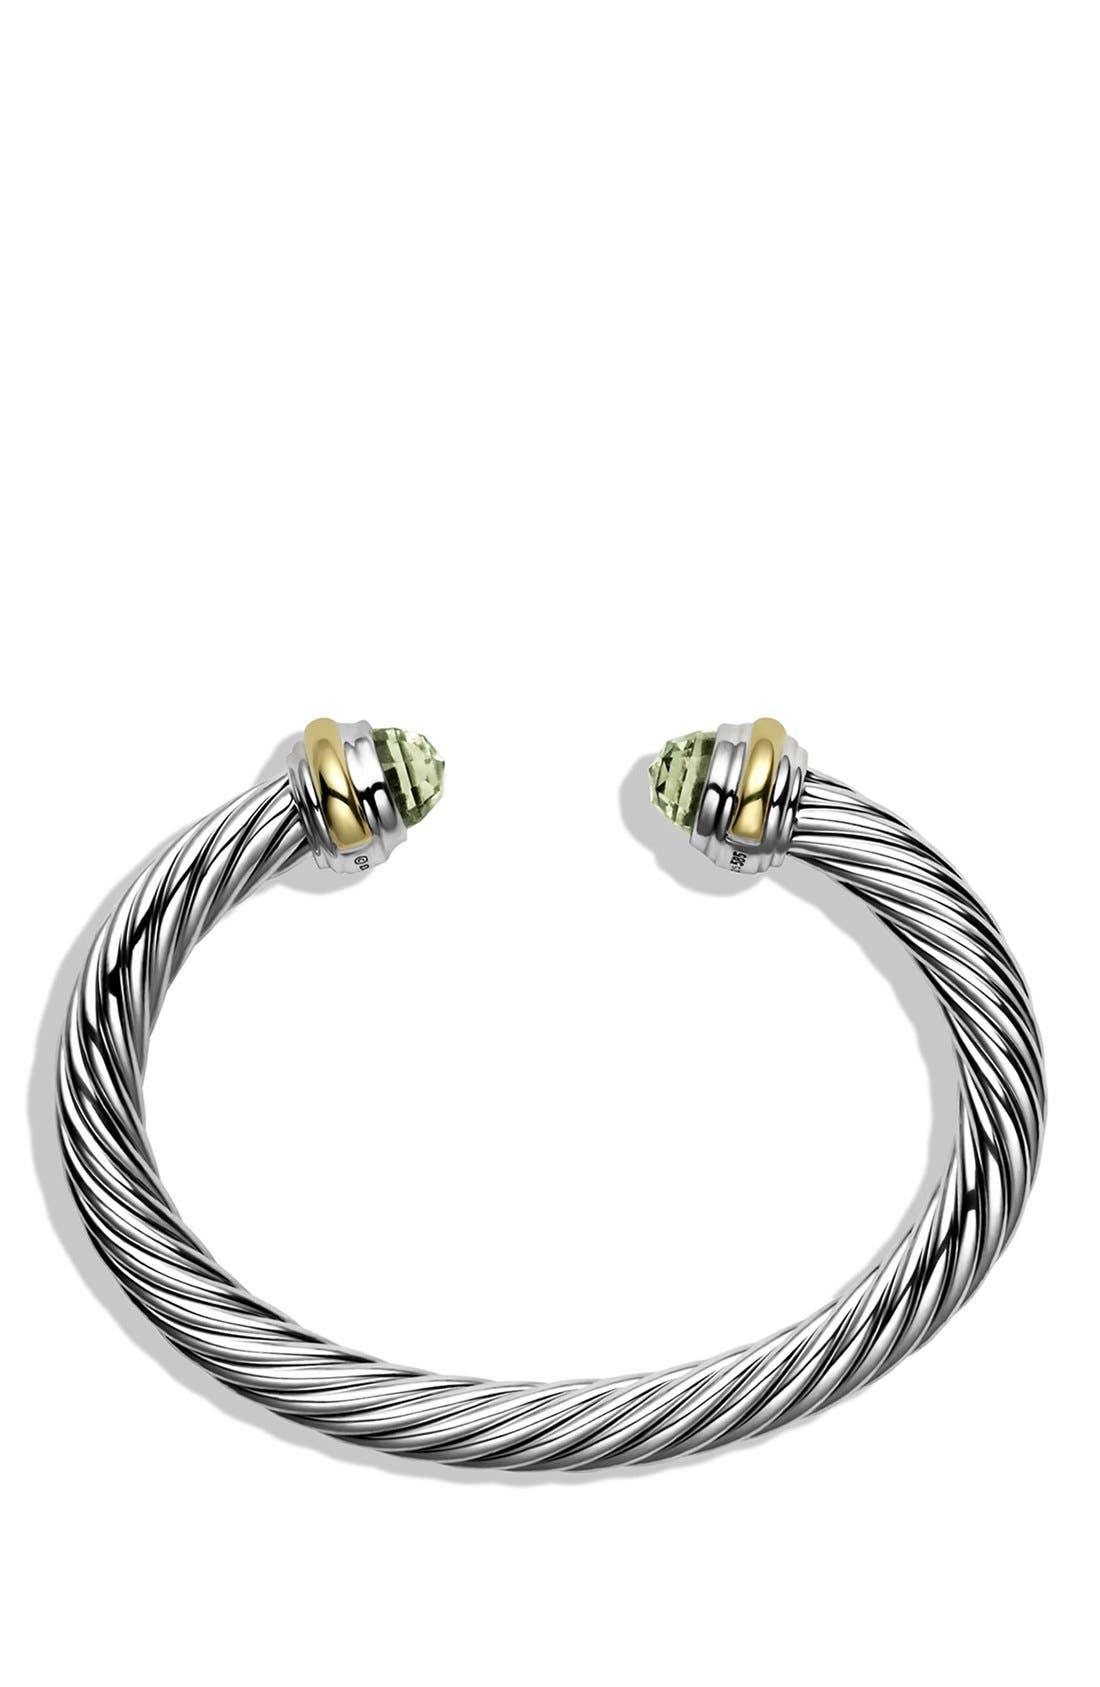 DAVID YURMAN, Cable Classics Bracelet with Semiprecious Stones & 14K Gold, 7mm, Alternate thumbnail 3, color, PRASIOLITE